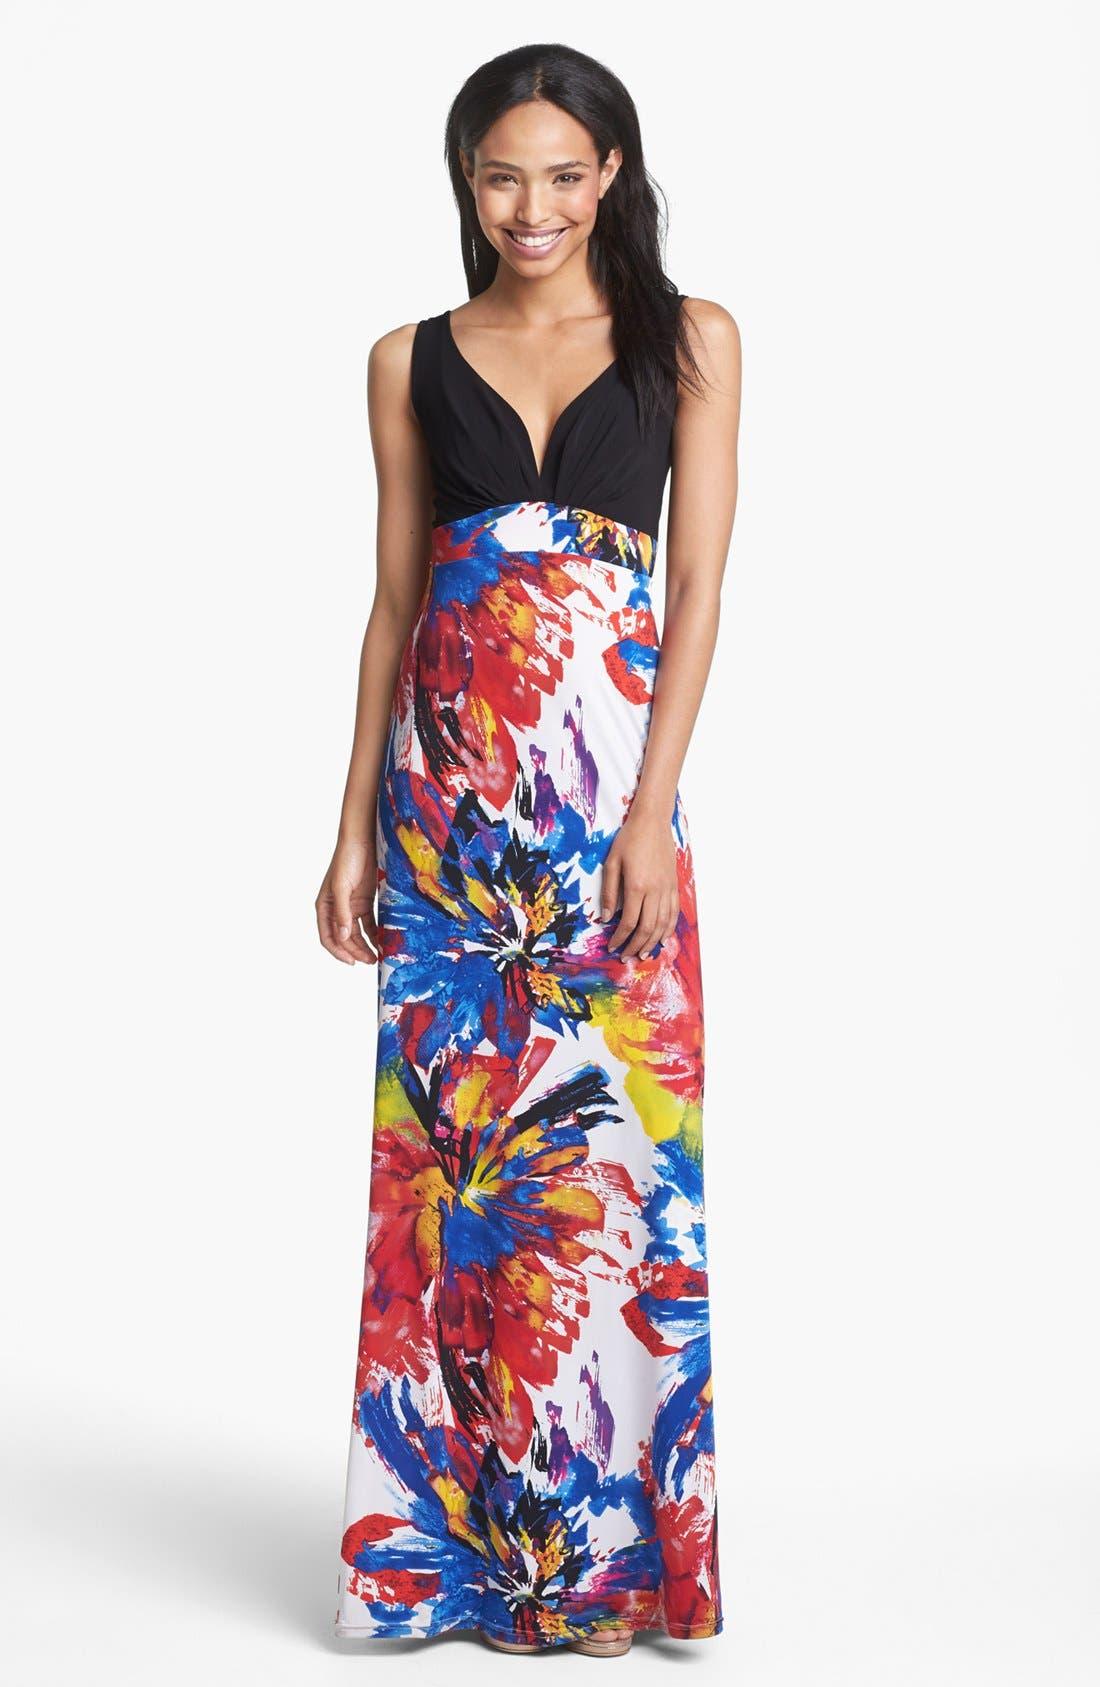 Main Image - Abi Ferrin 'India' Print Sleeveless Maxi Dress